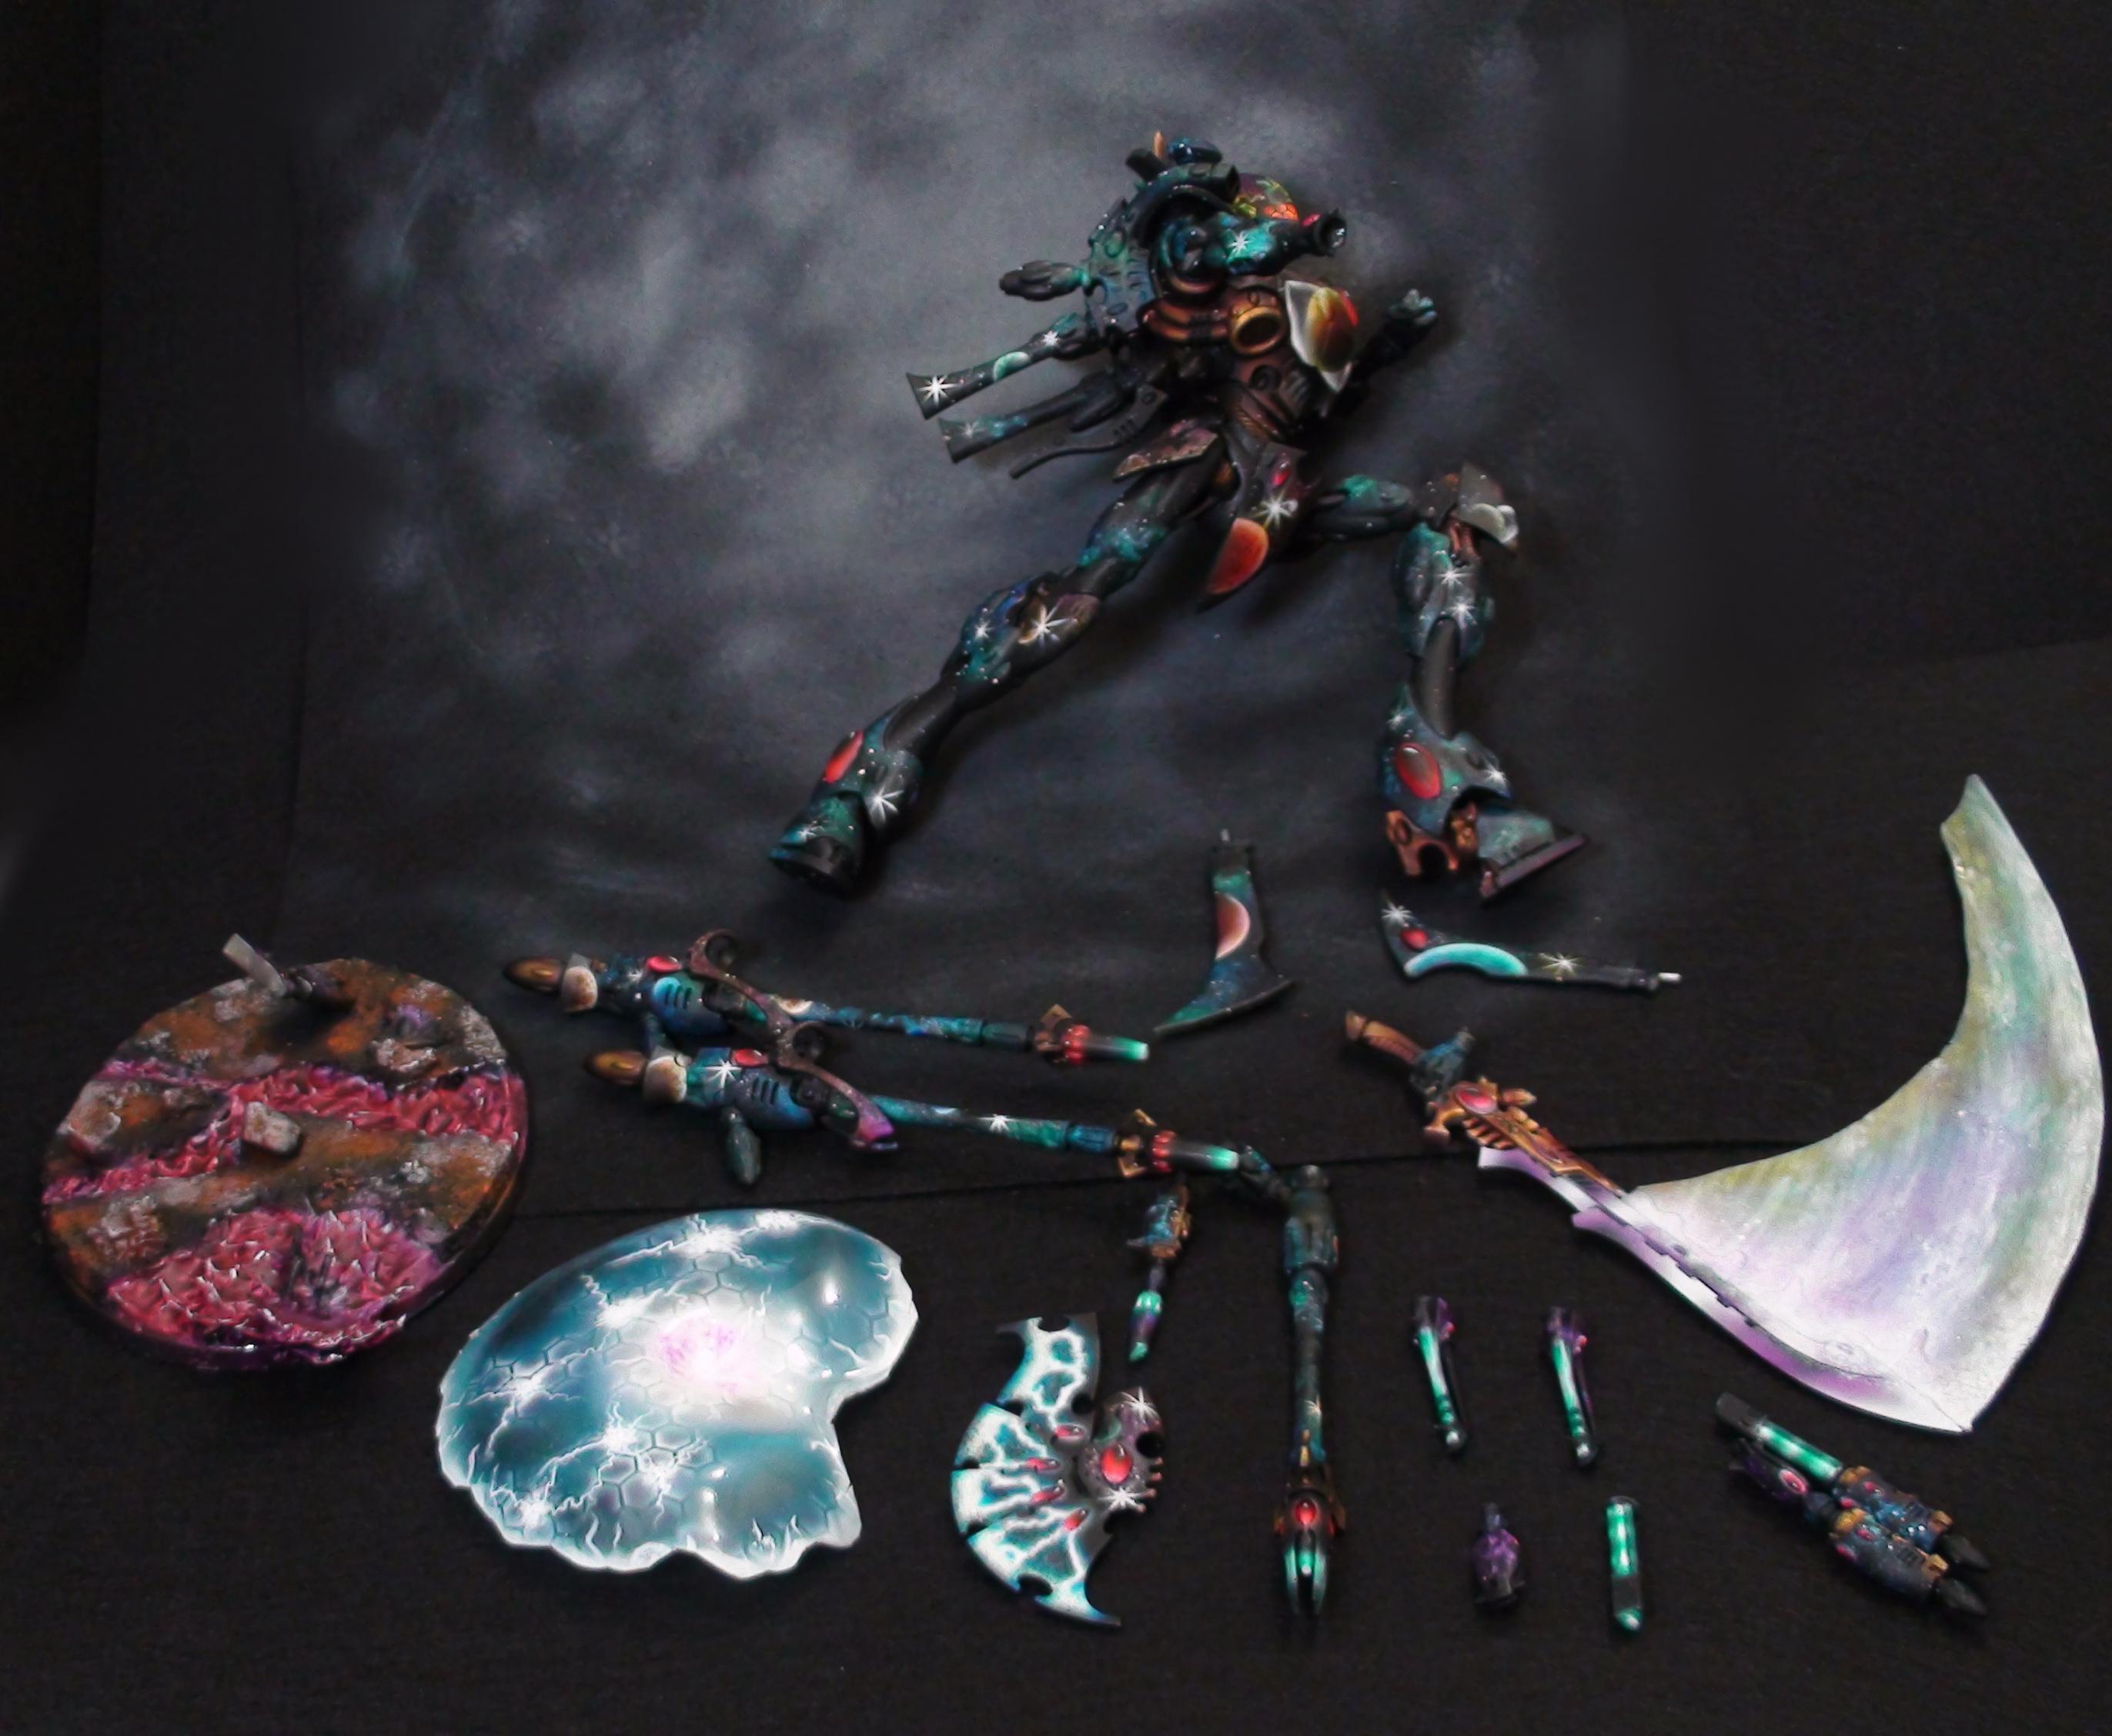 Airbrush, Eldar, Warhammer 40,000, Warhammer Fantasy, Wraith